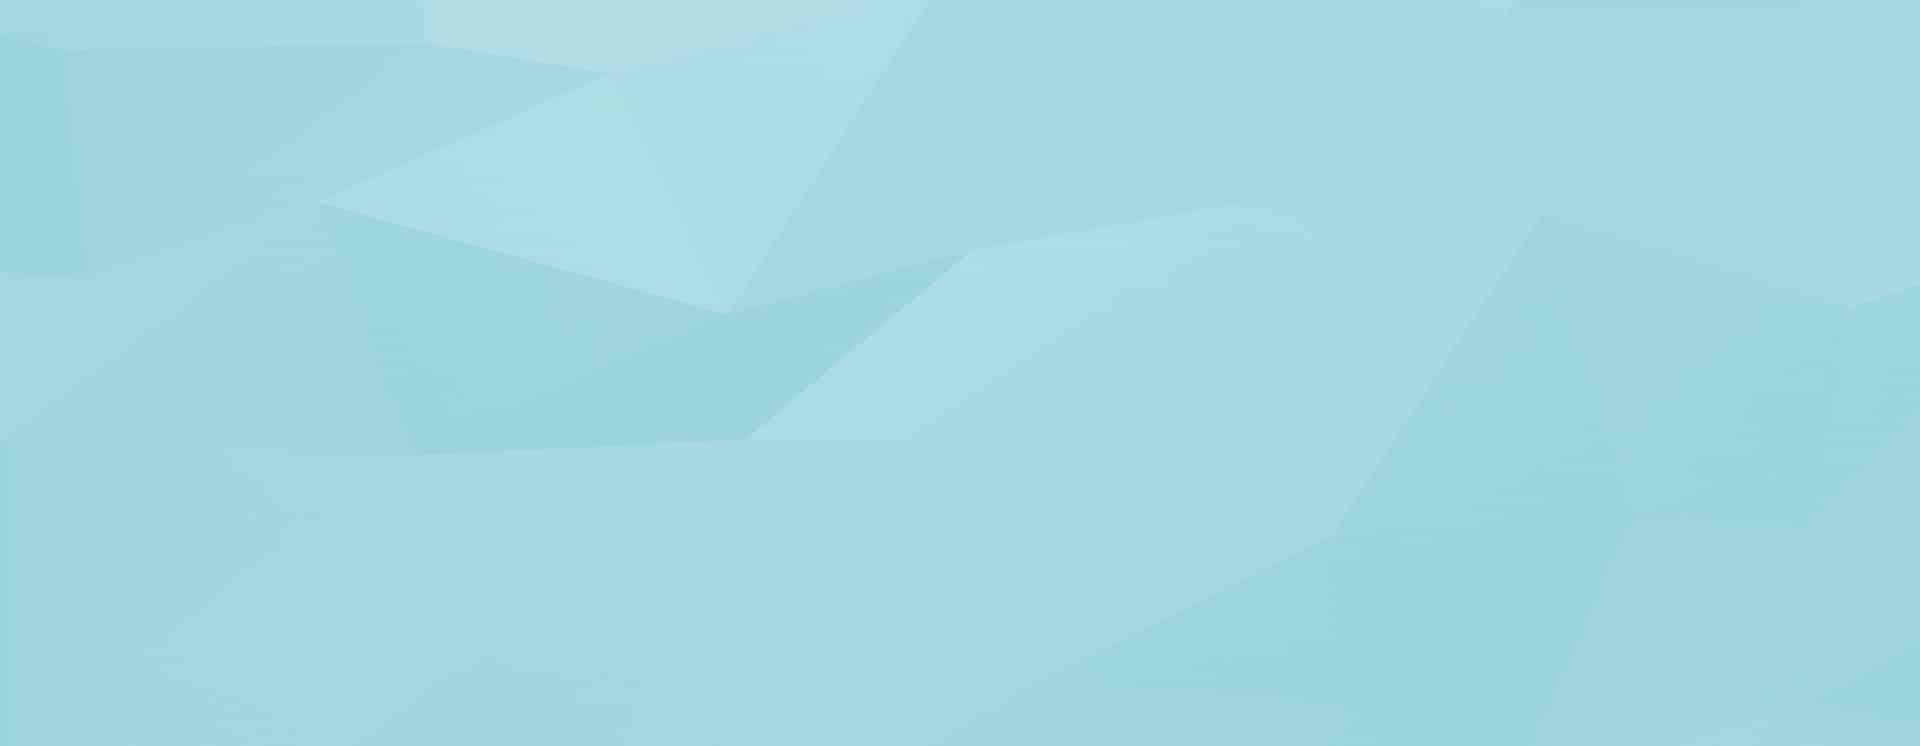 polygon_blue_light